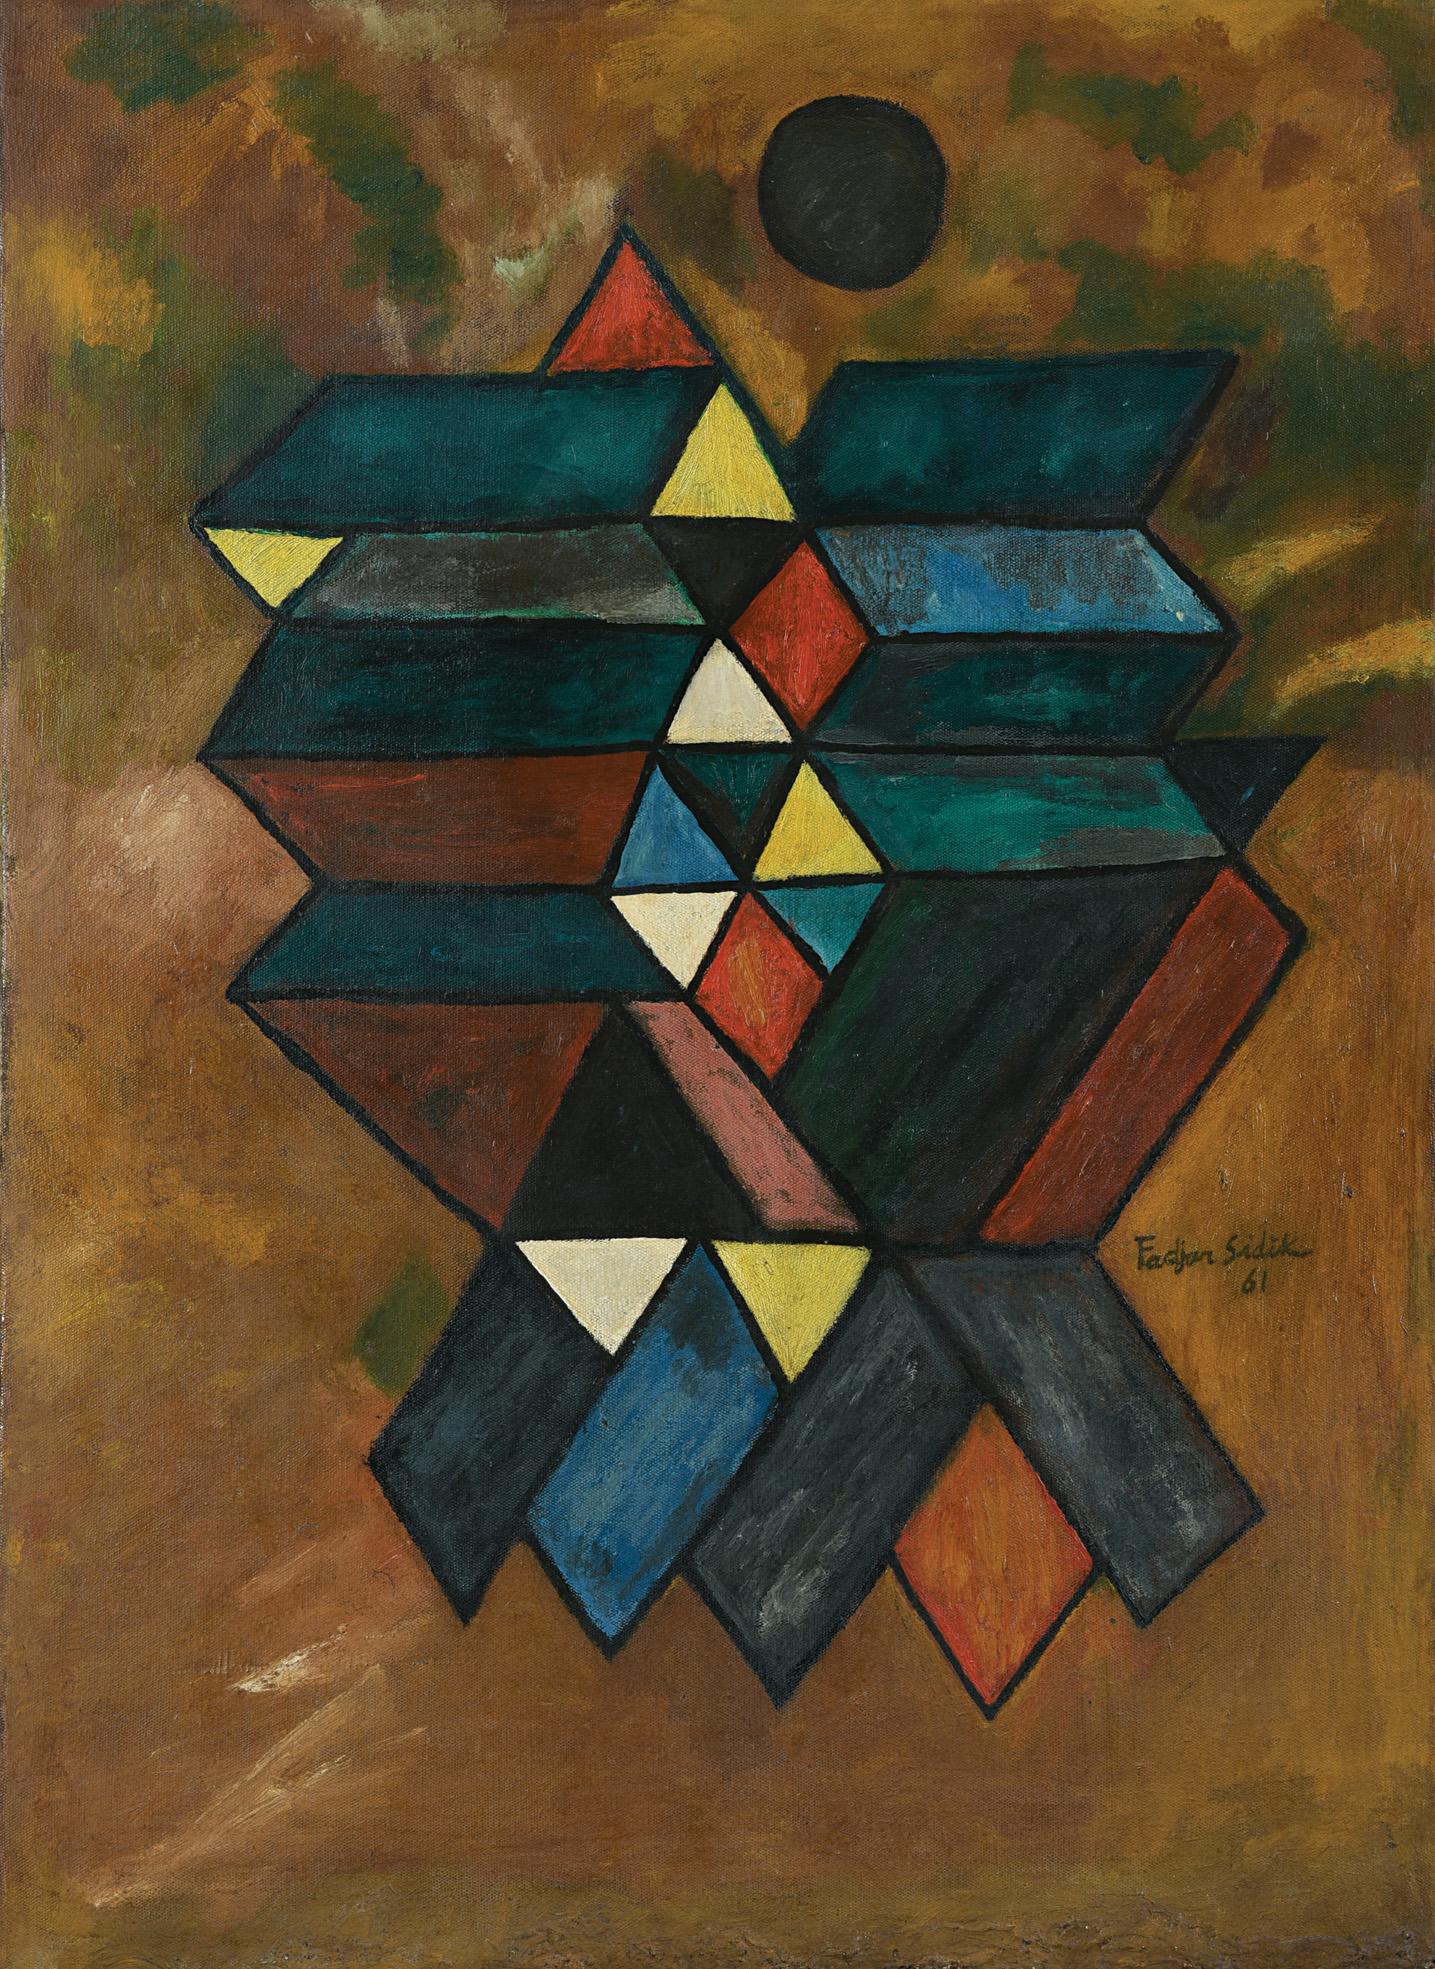 Fadjar Sidik, Untitled, oil on canvas, 75 x 55 cm, 1961